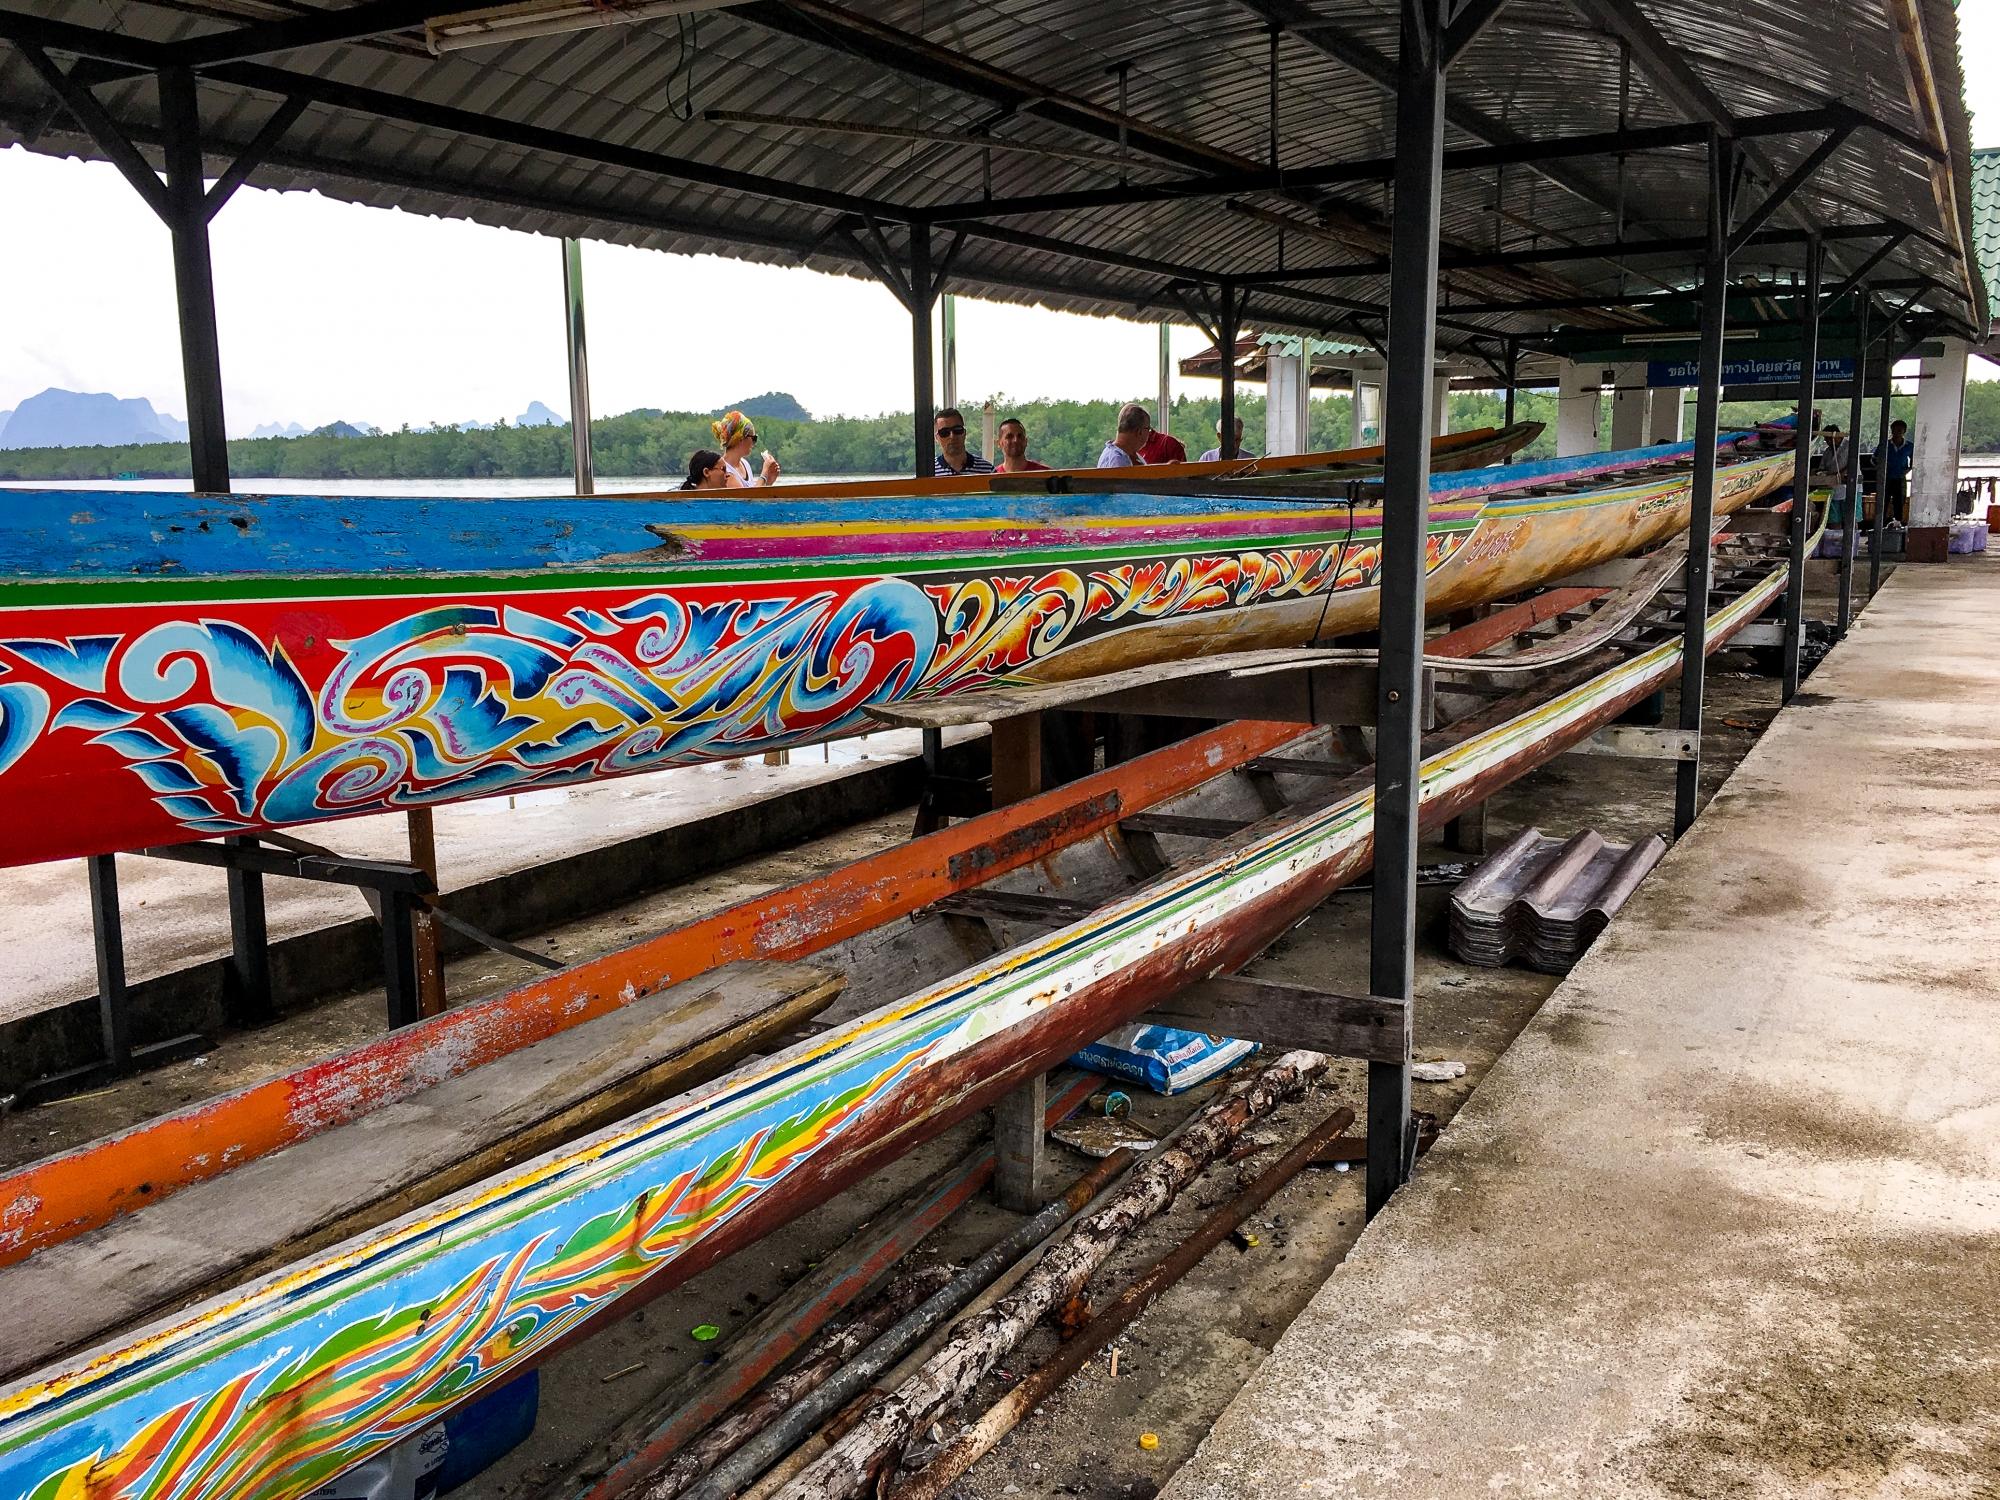 Boats in Panyee Village on Koh Panyee Island